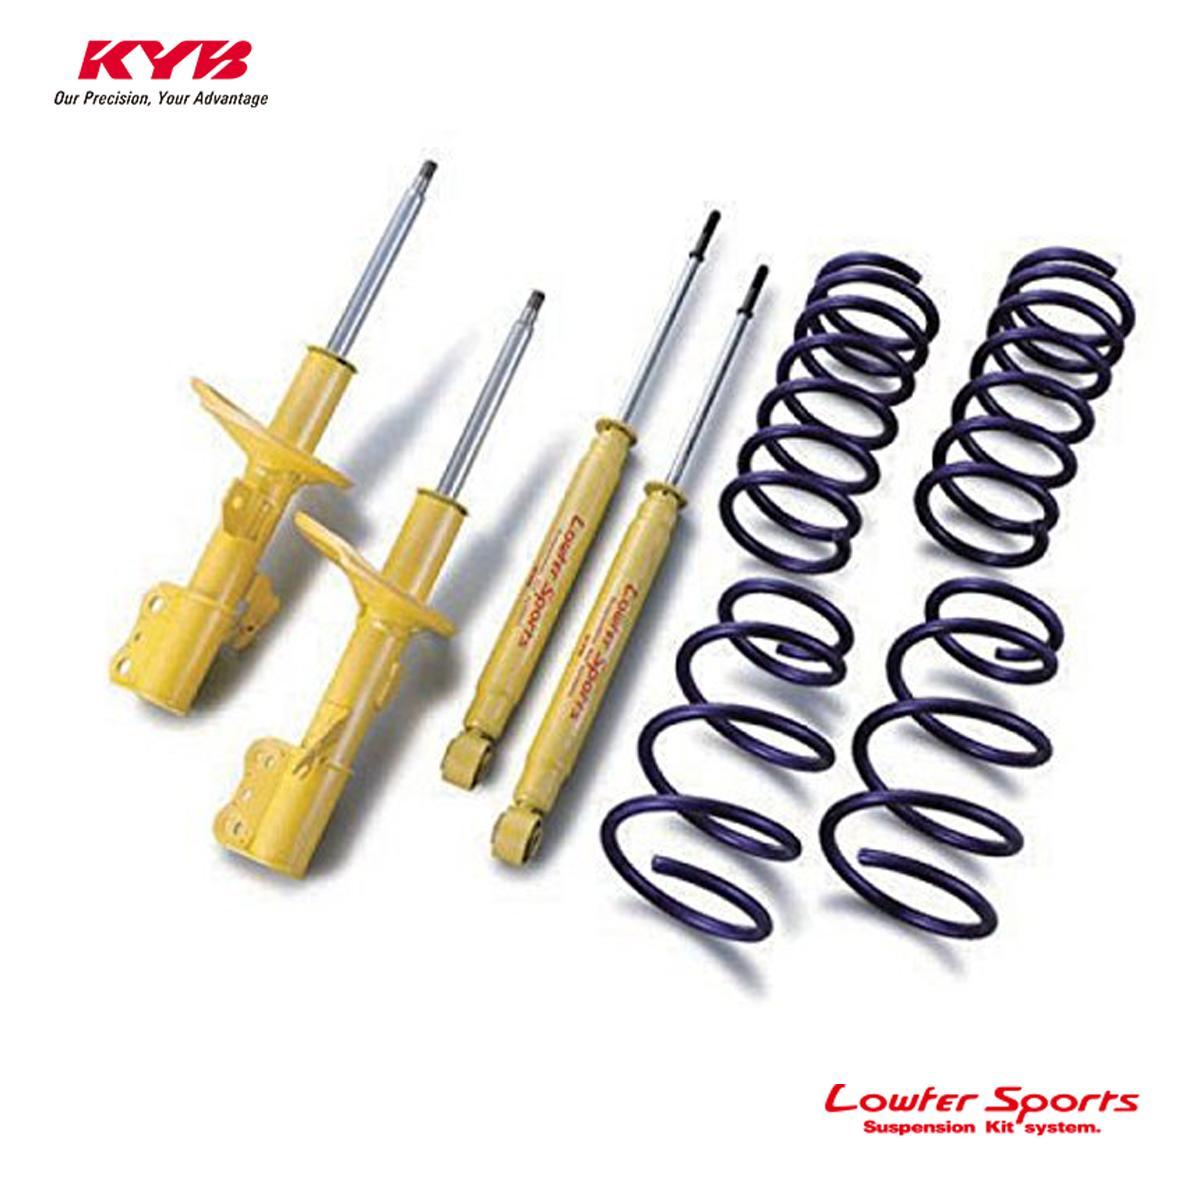 KYB カヤバ スイフト ZC72S ショックアブソーバー サスペンションキット Lowfer Sports LKIT-ZC72S 配送先条件有り